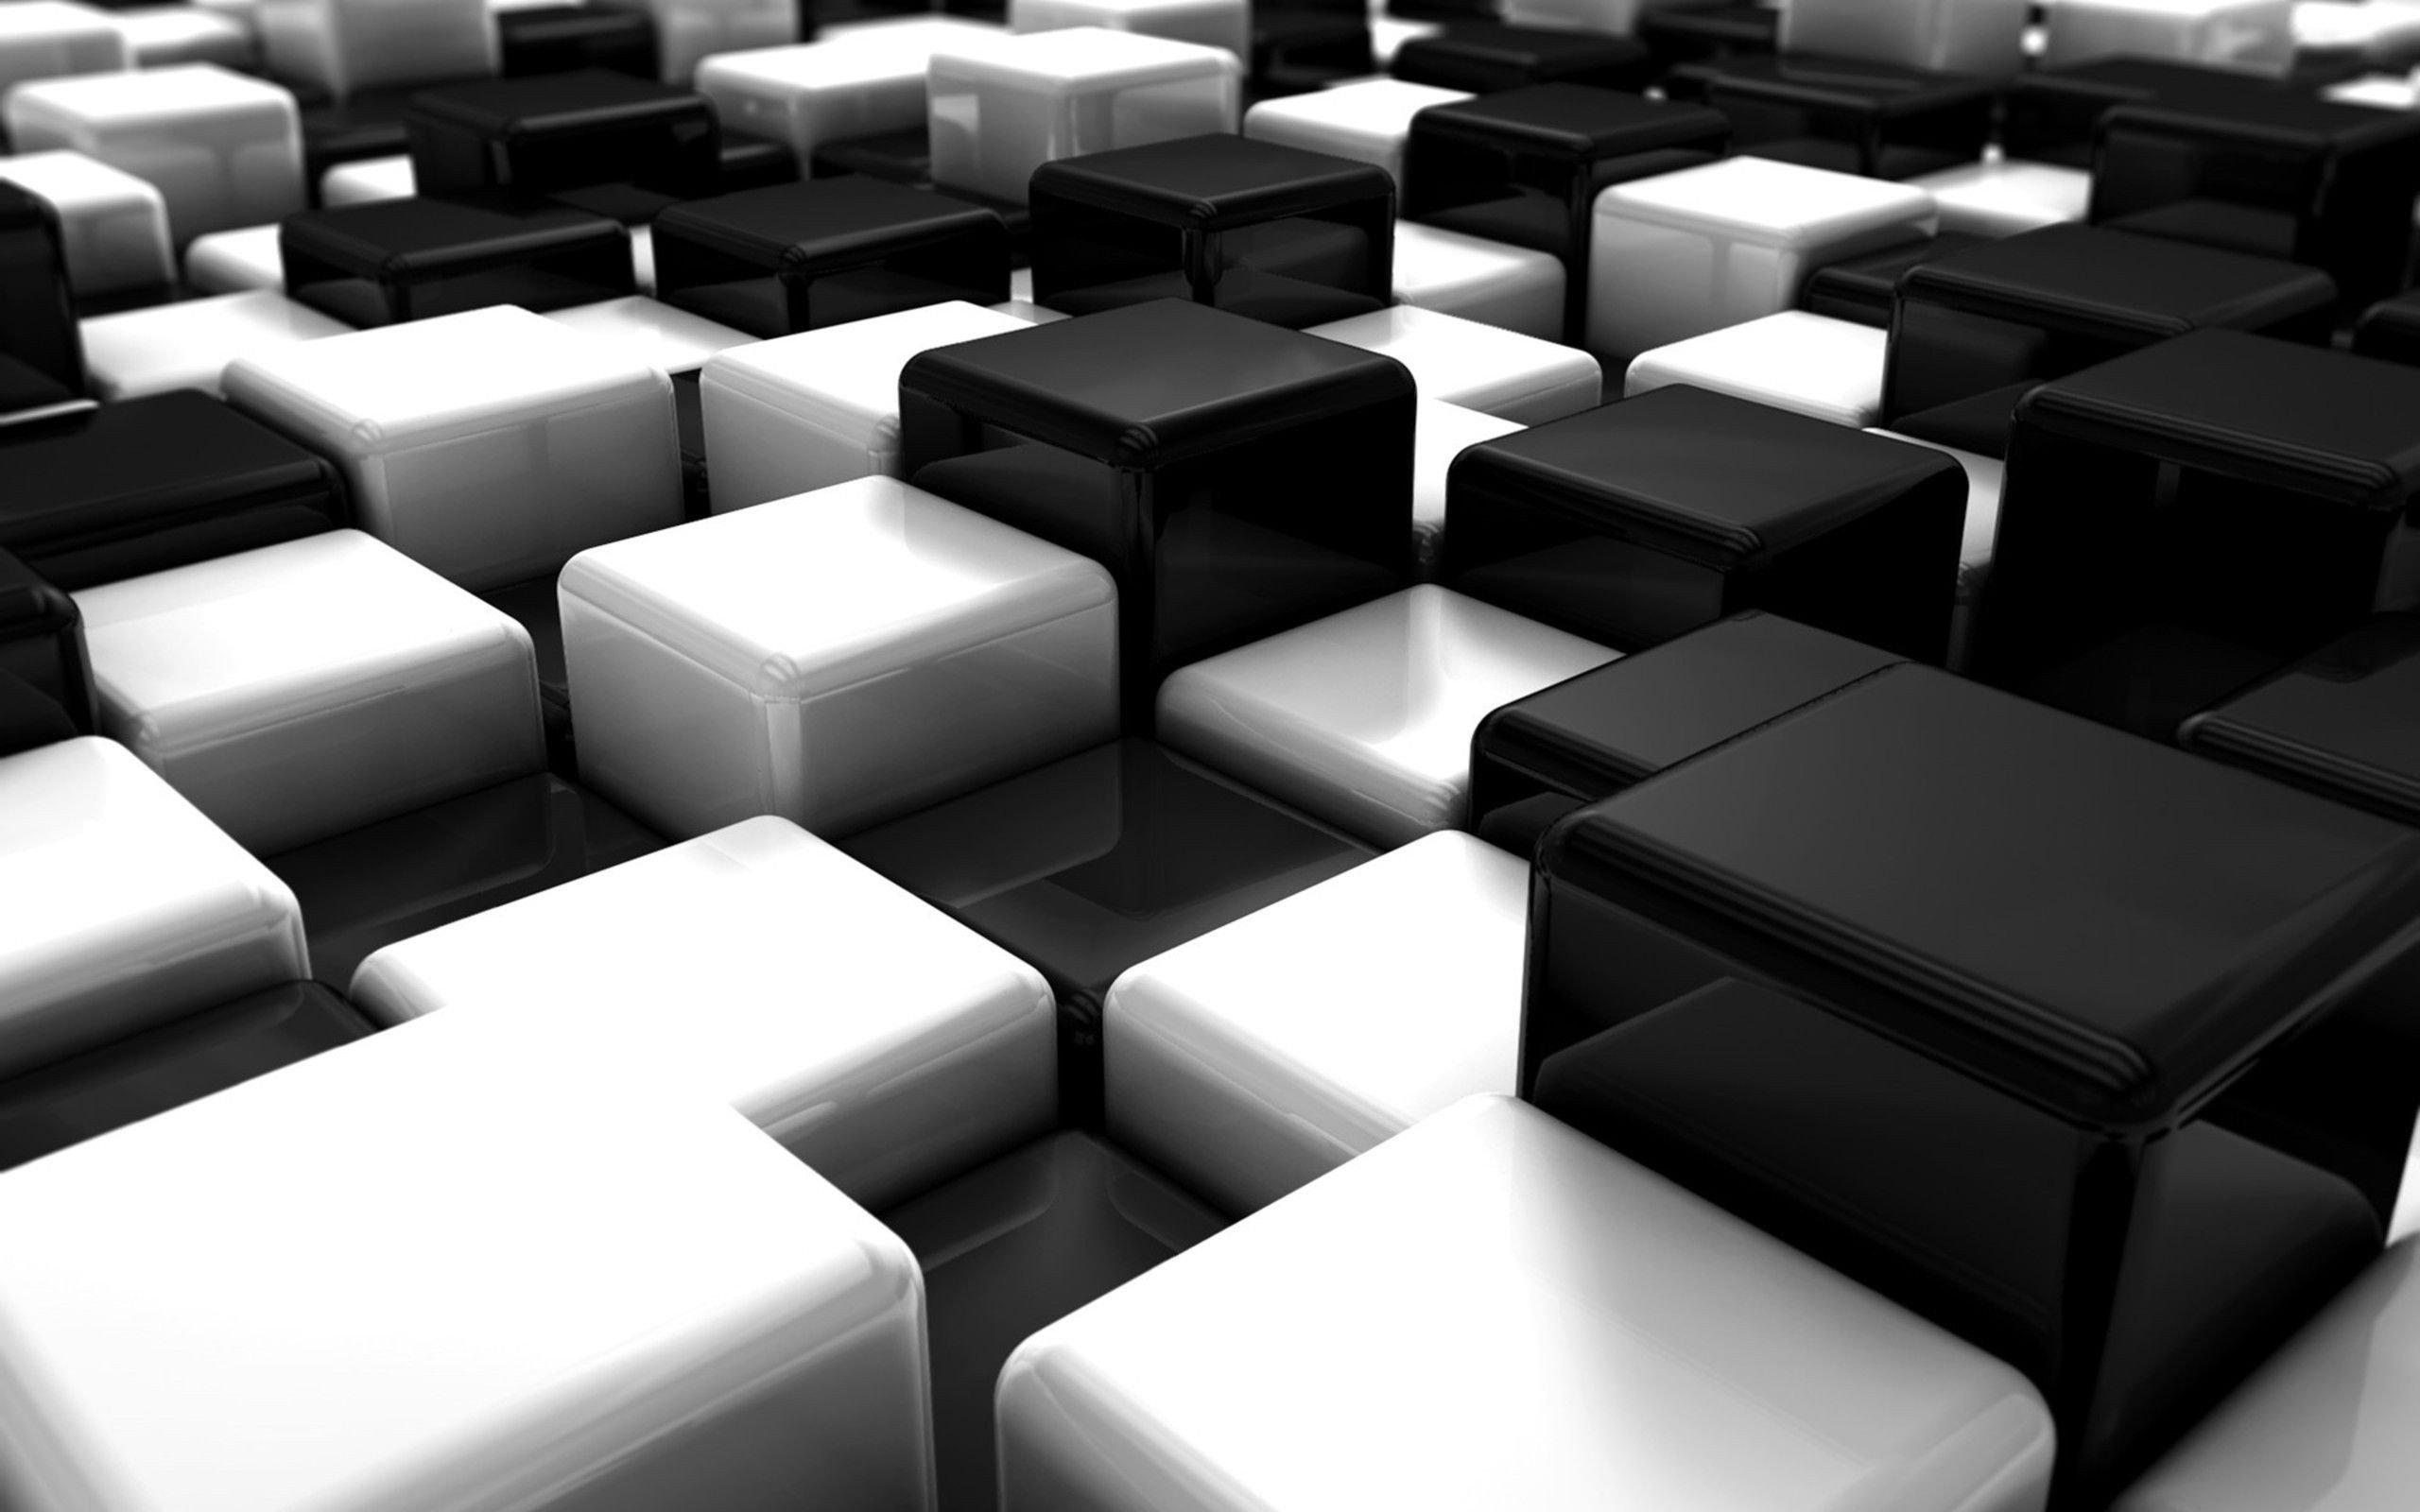 Abstract Black And White Blocks Cubes Digital Art Wallpaper